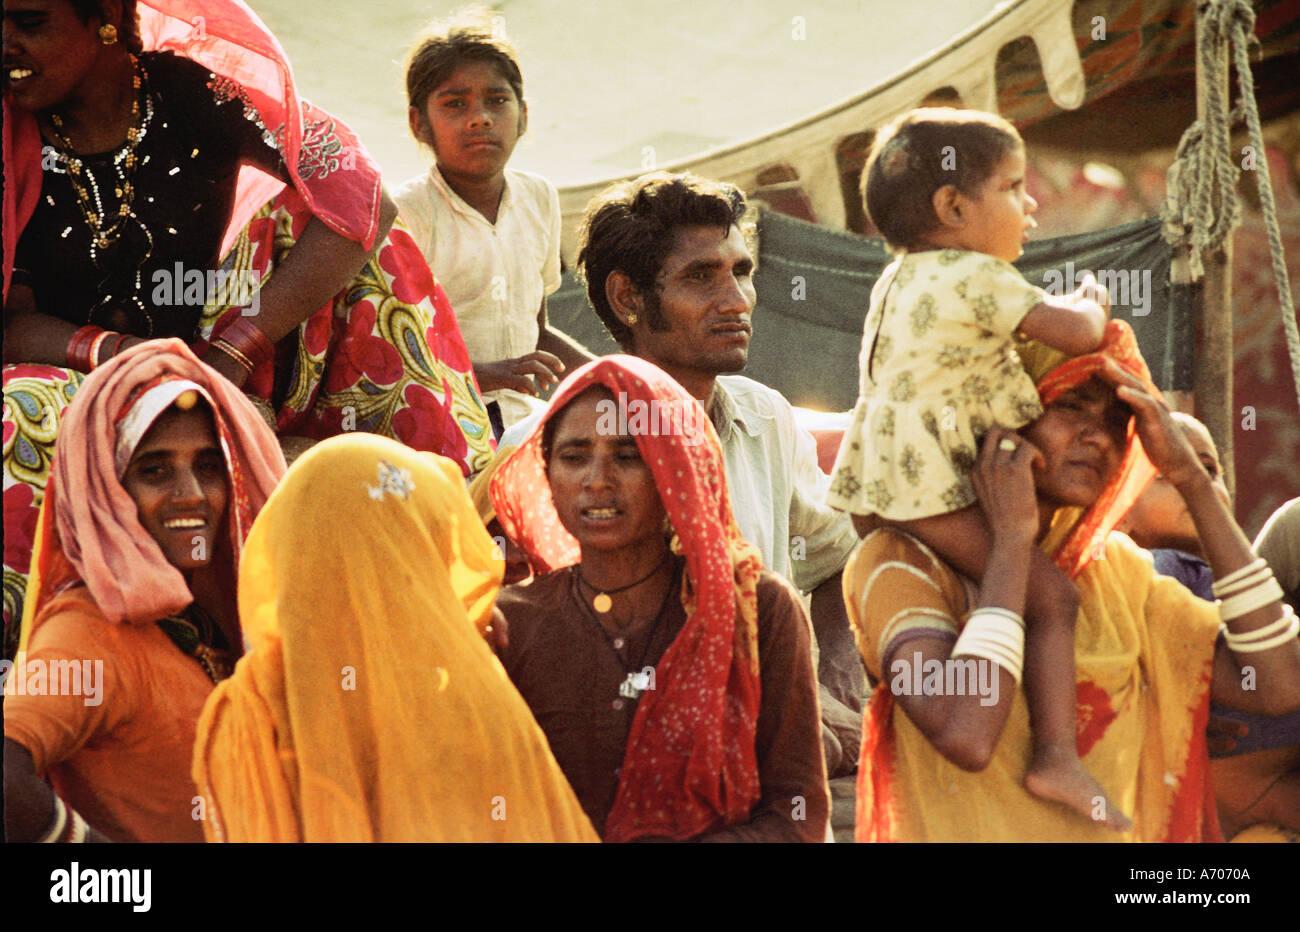 Rajasthani Women - Stock Image